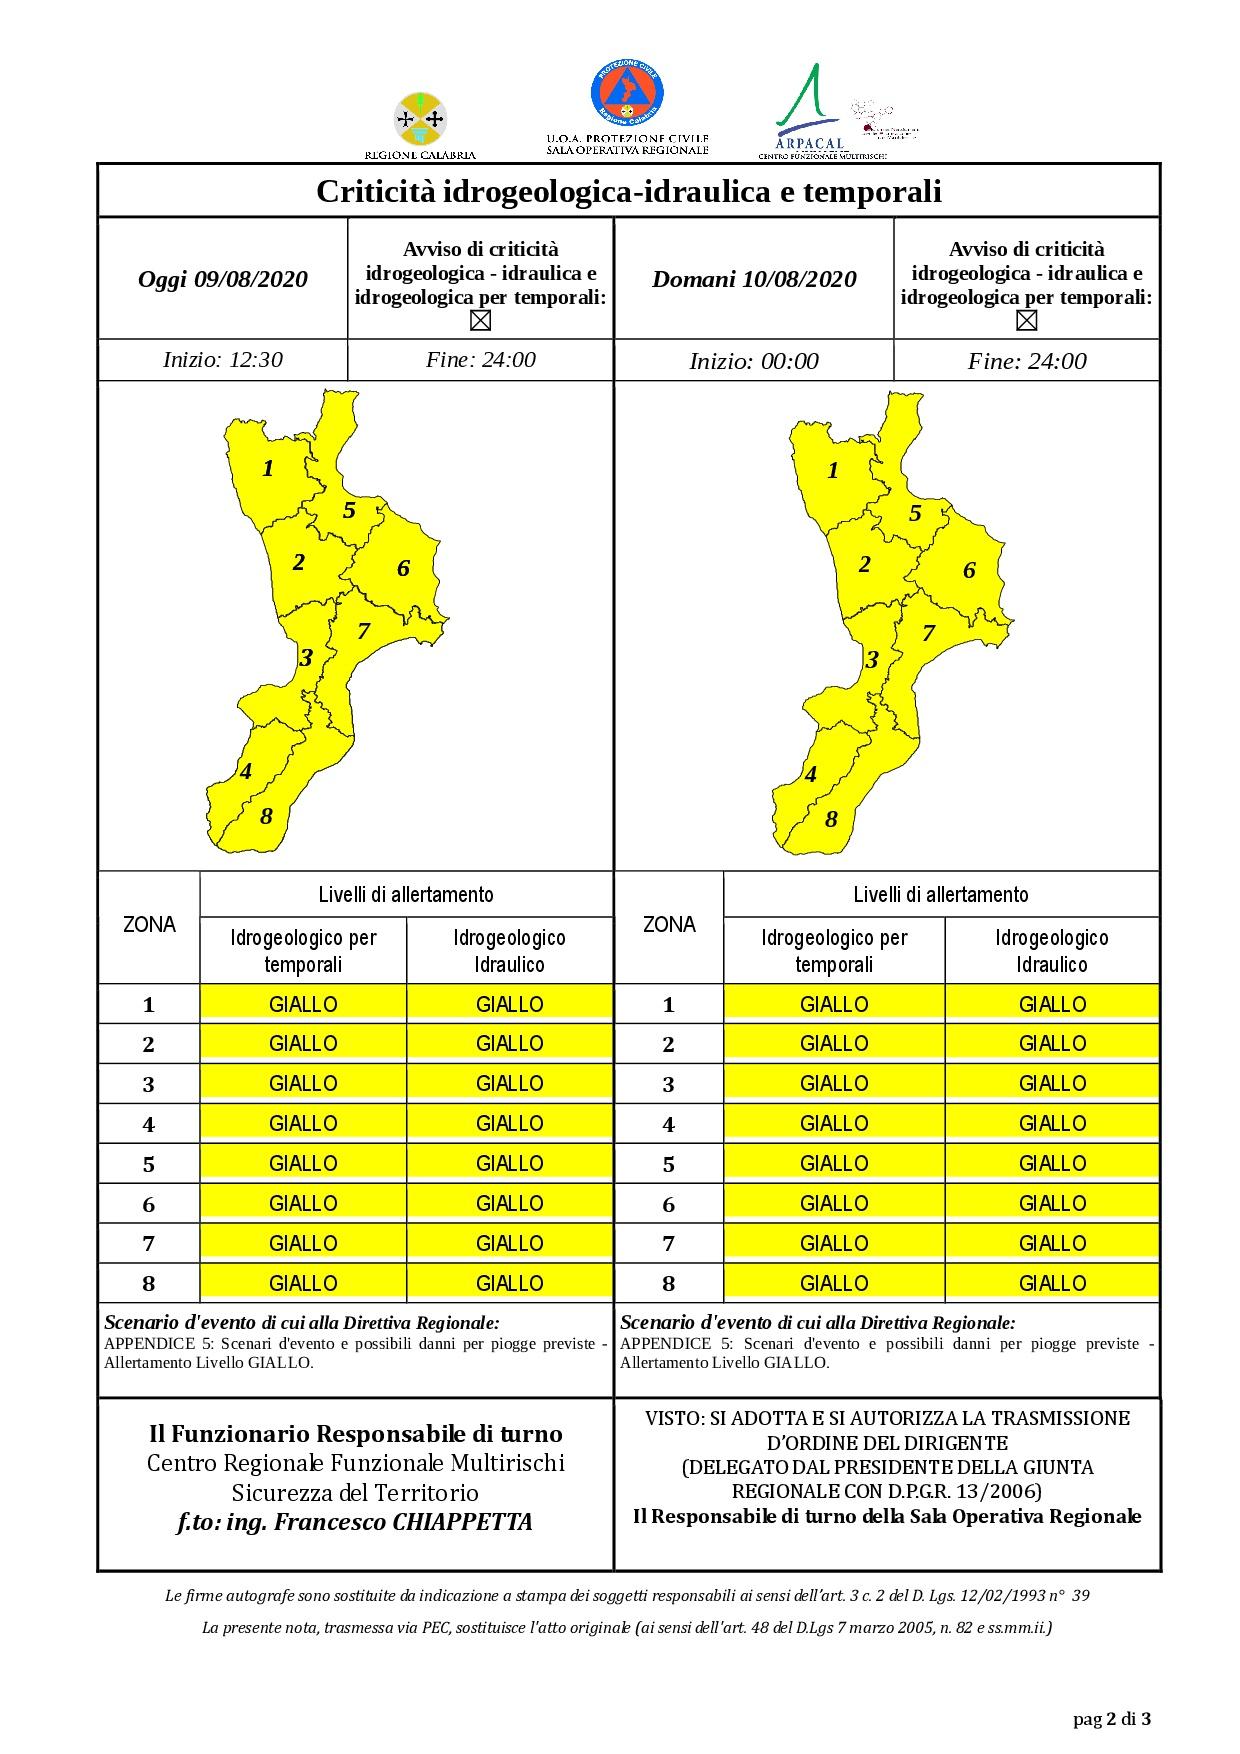 Criticità idrogeologica-idraulica e temporali in Calabria 09-08-2020